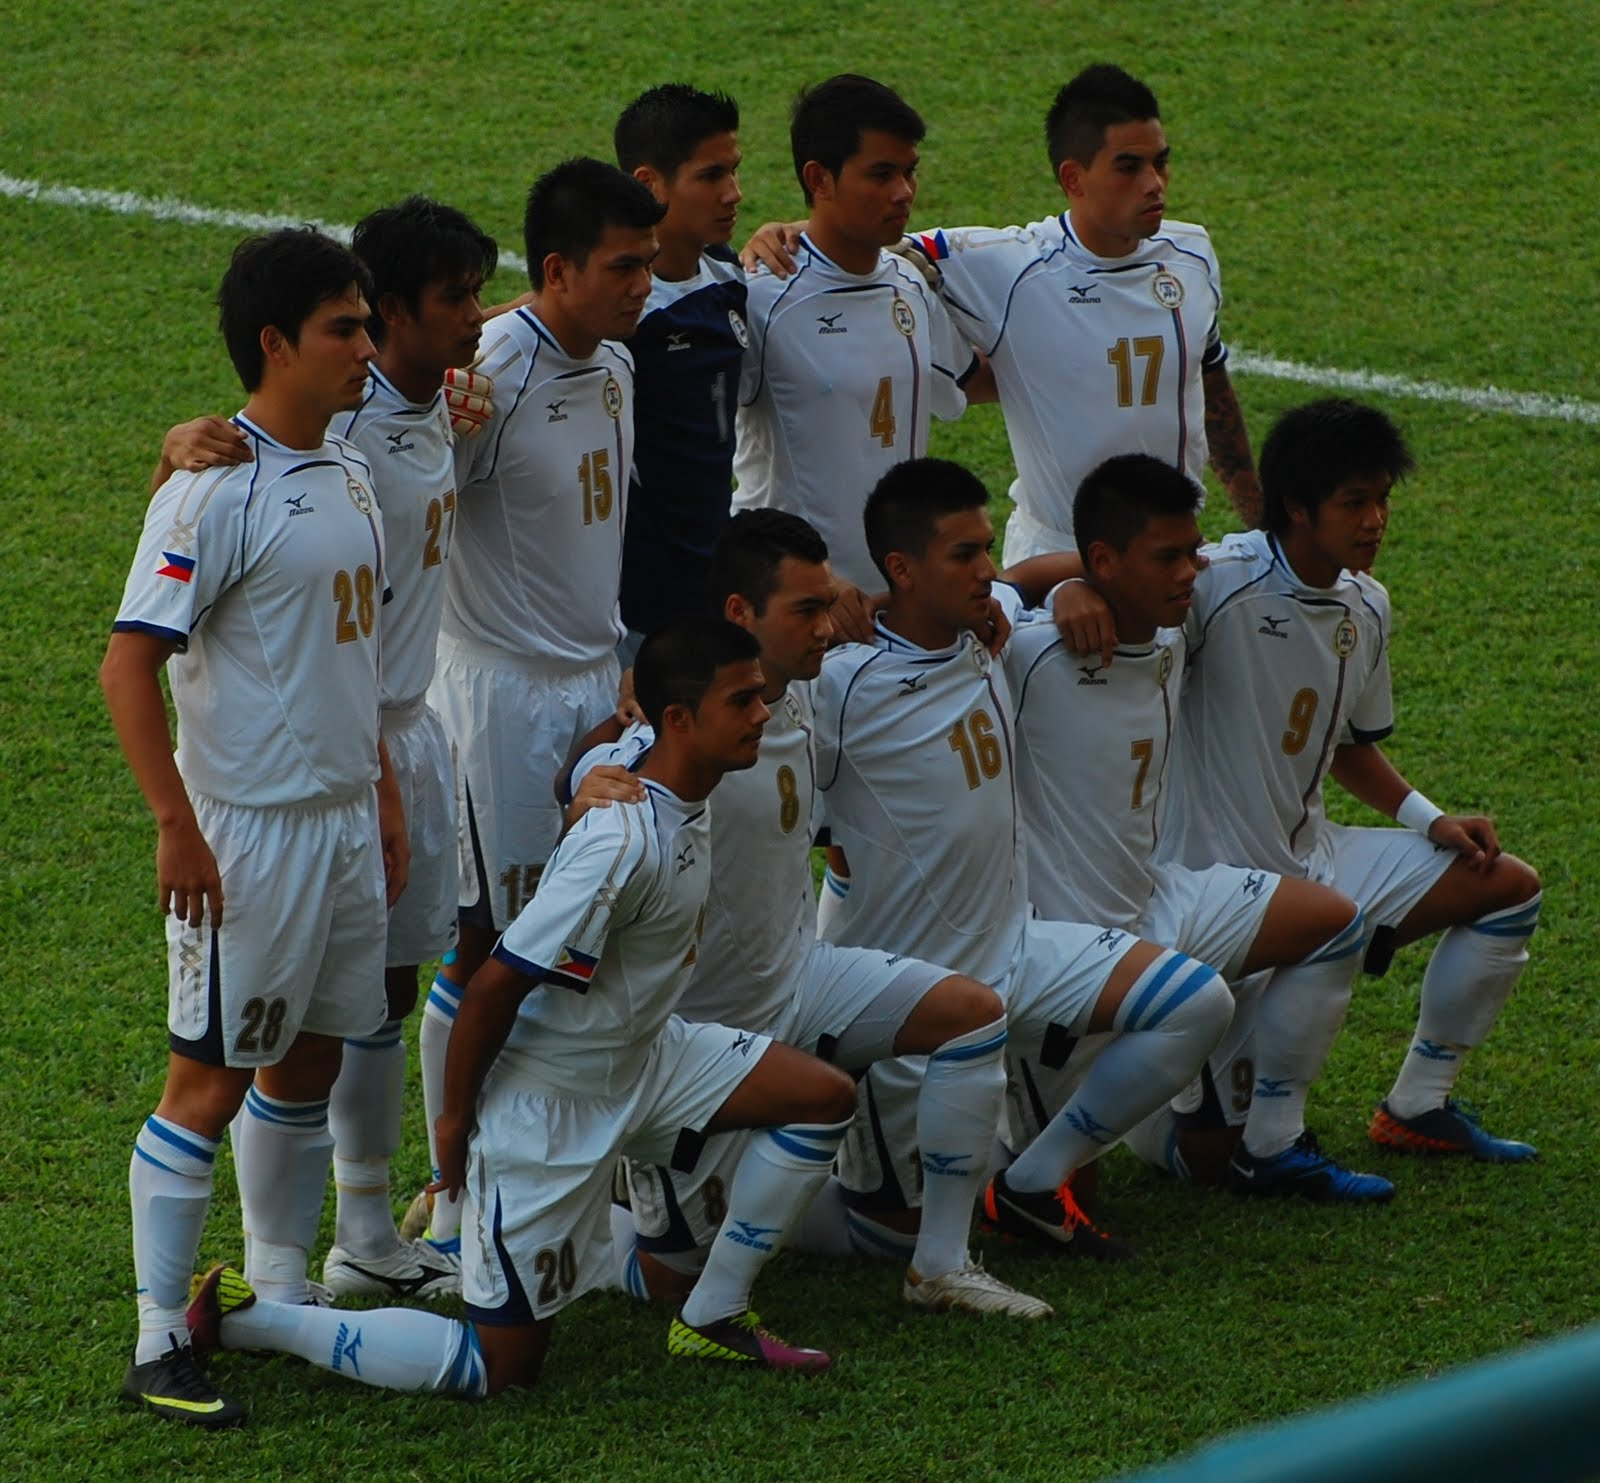 Indonesia U18 Vs Laos: Asian Football Pictures: Philippines V Laos 3-2